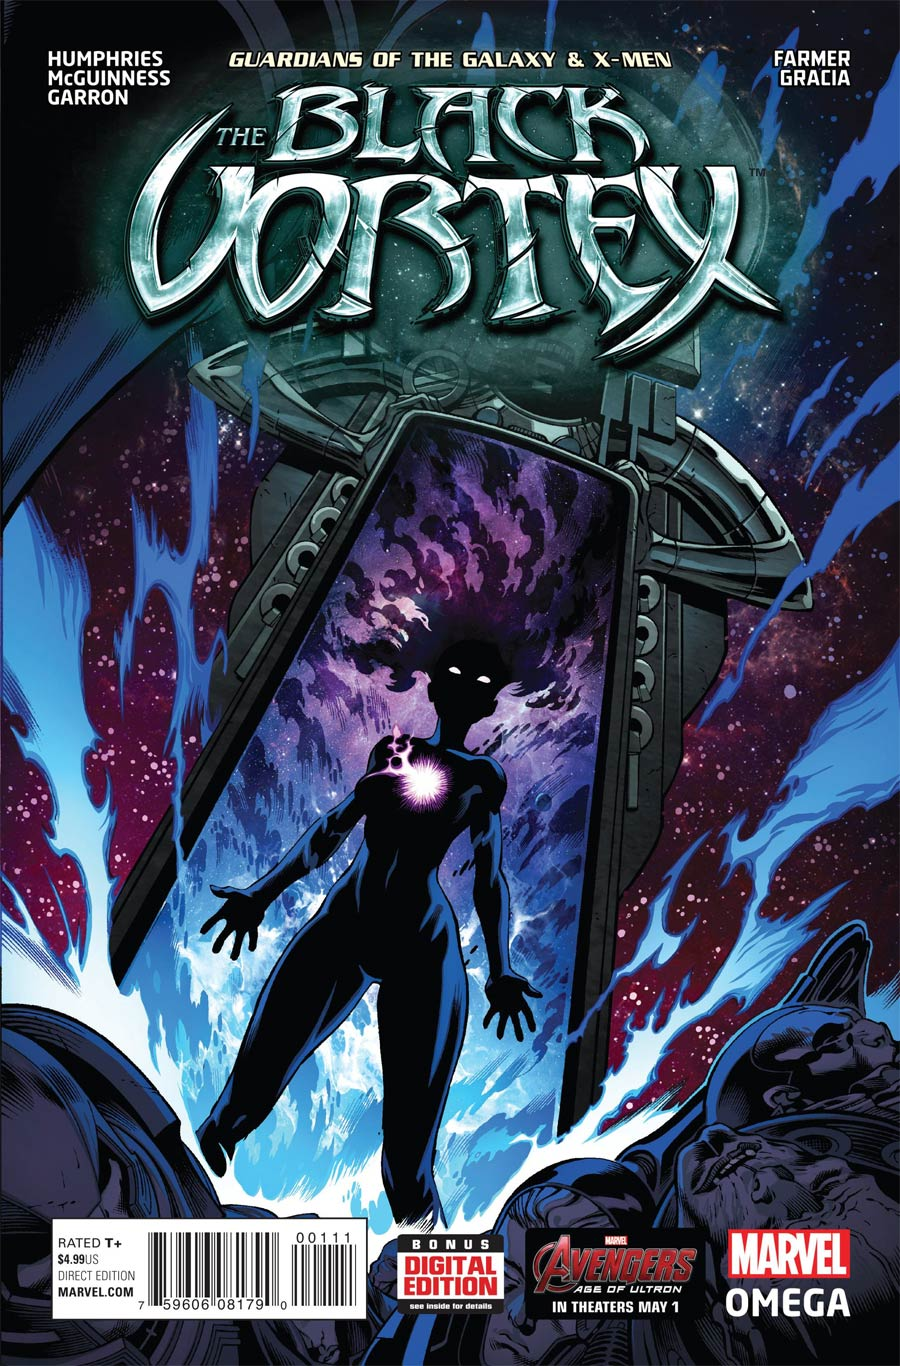 Guardians Of The Galaxy & X-Men Black Vortex Omega #1 Cover A Regular Ed McGuinness Cover (Black Vortex Part 13)